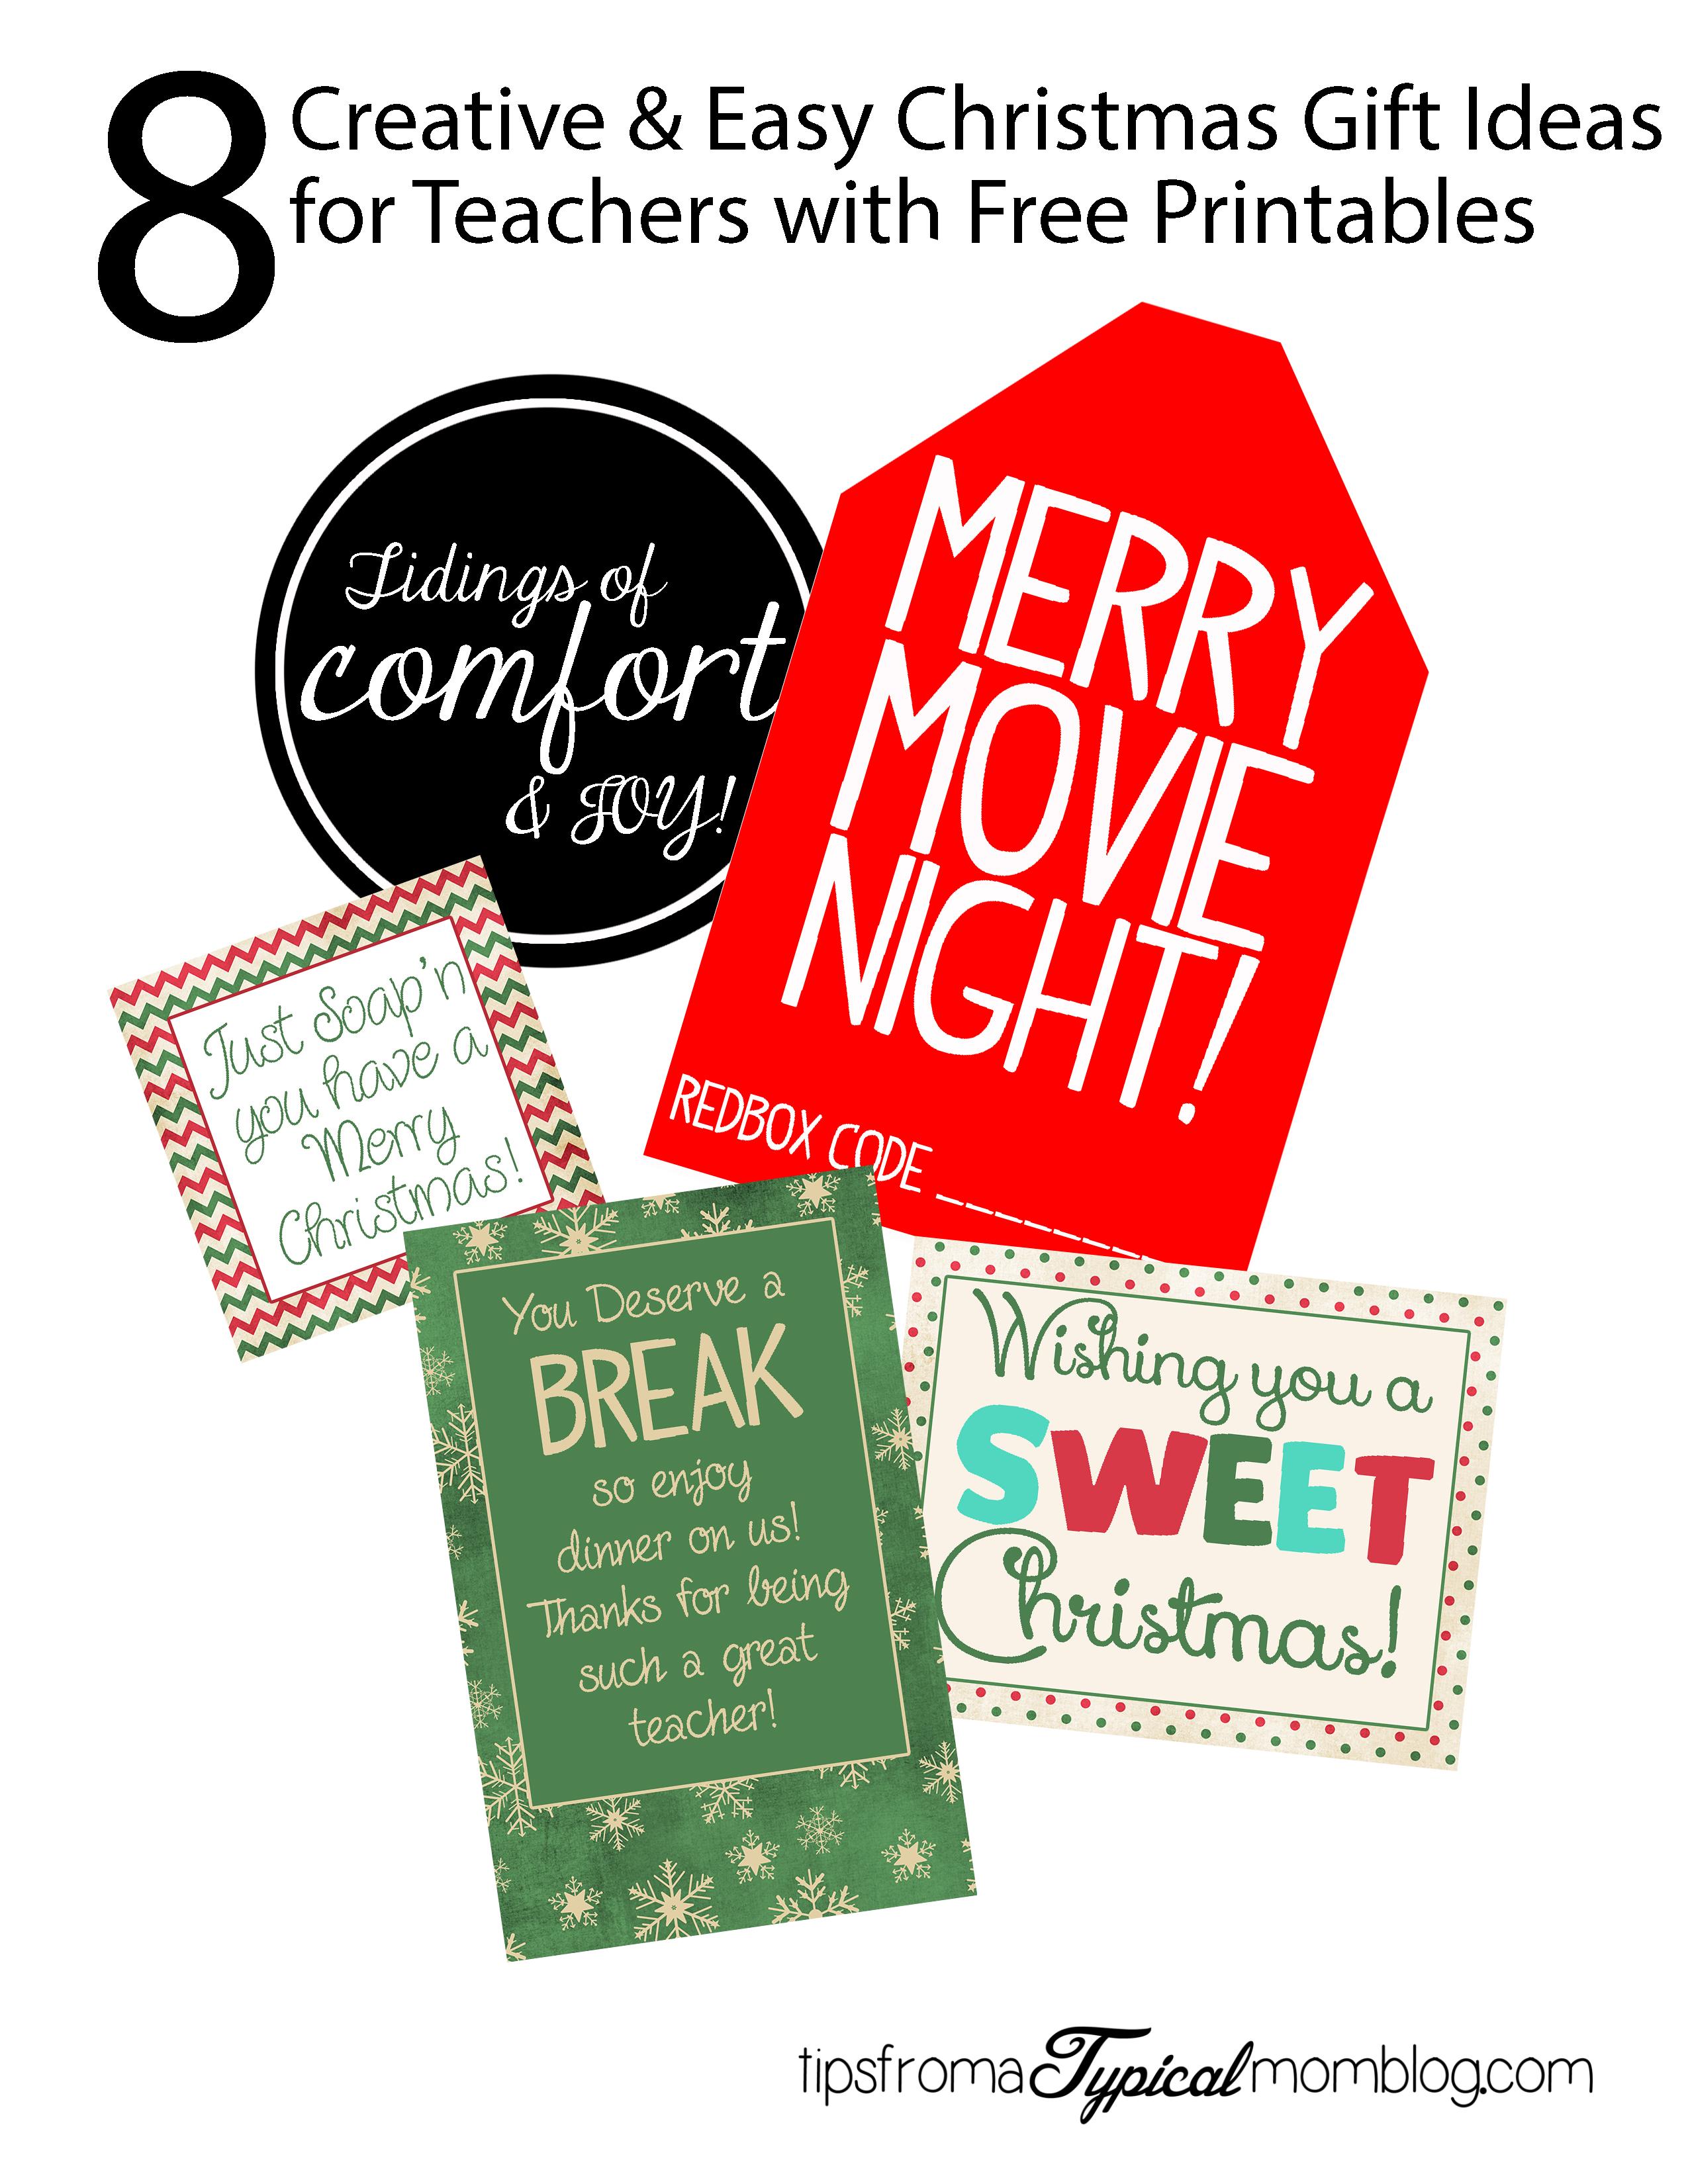 photograph regarding Christmas Gift Tags Printable identified as 8 Straightforward and Basic Trainer Xmas Reward Designs with Printable